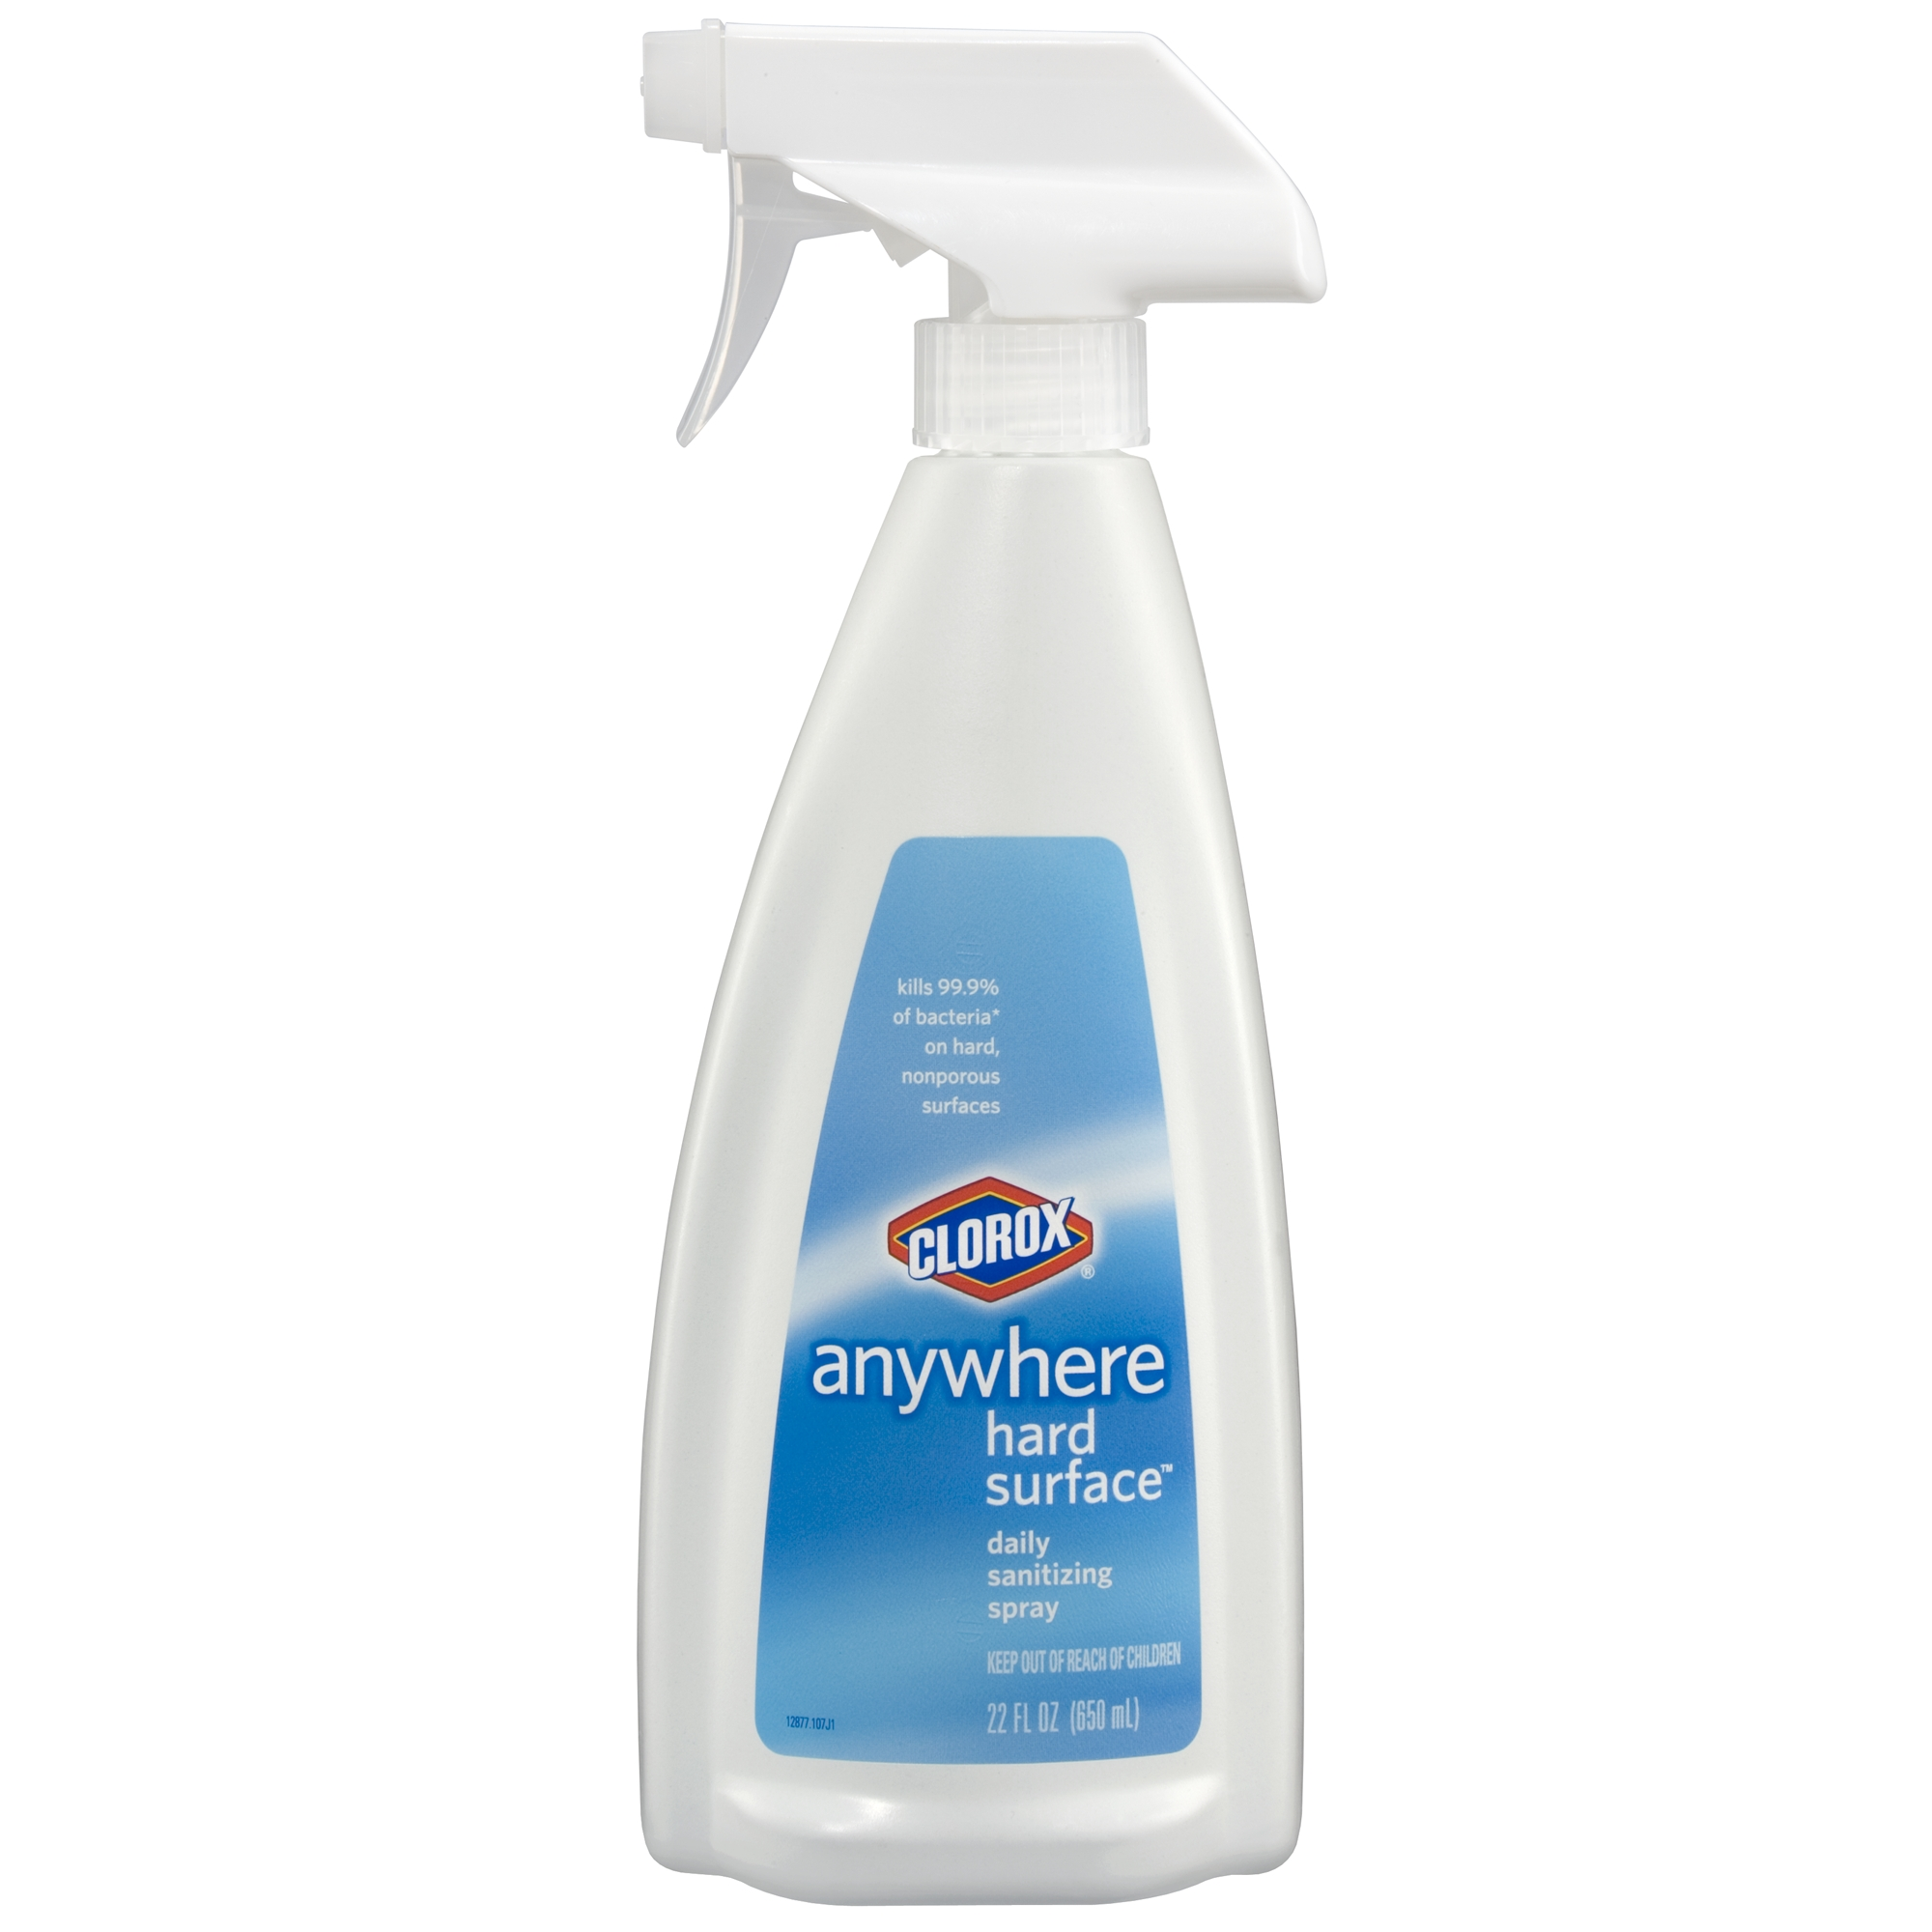 Clorox Anywhere Hard Surface Daily Sanitizing Spray, 22 oz